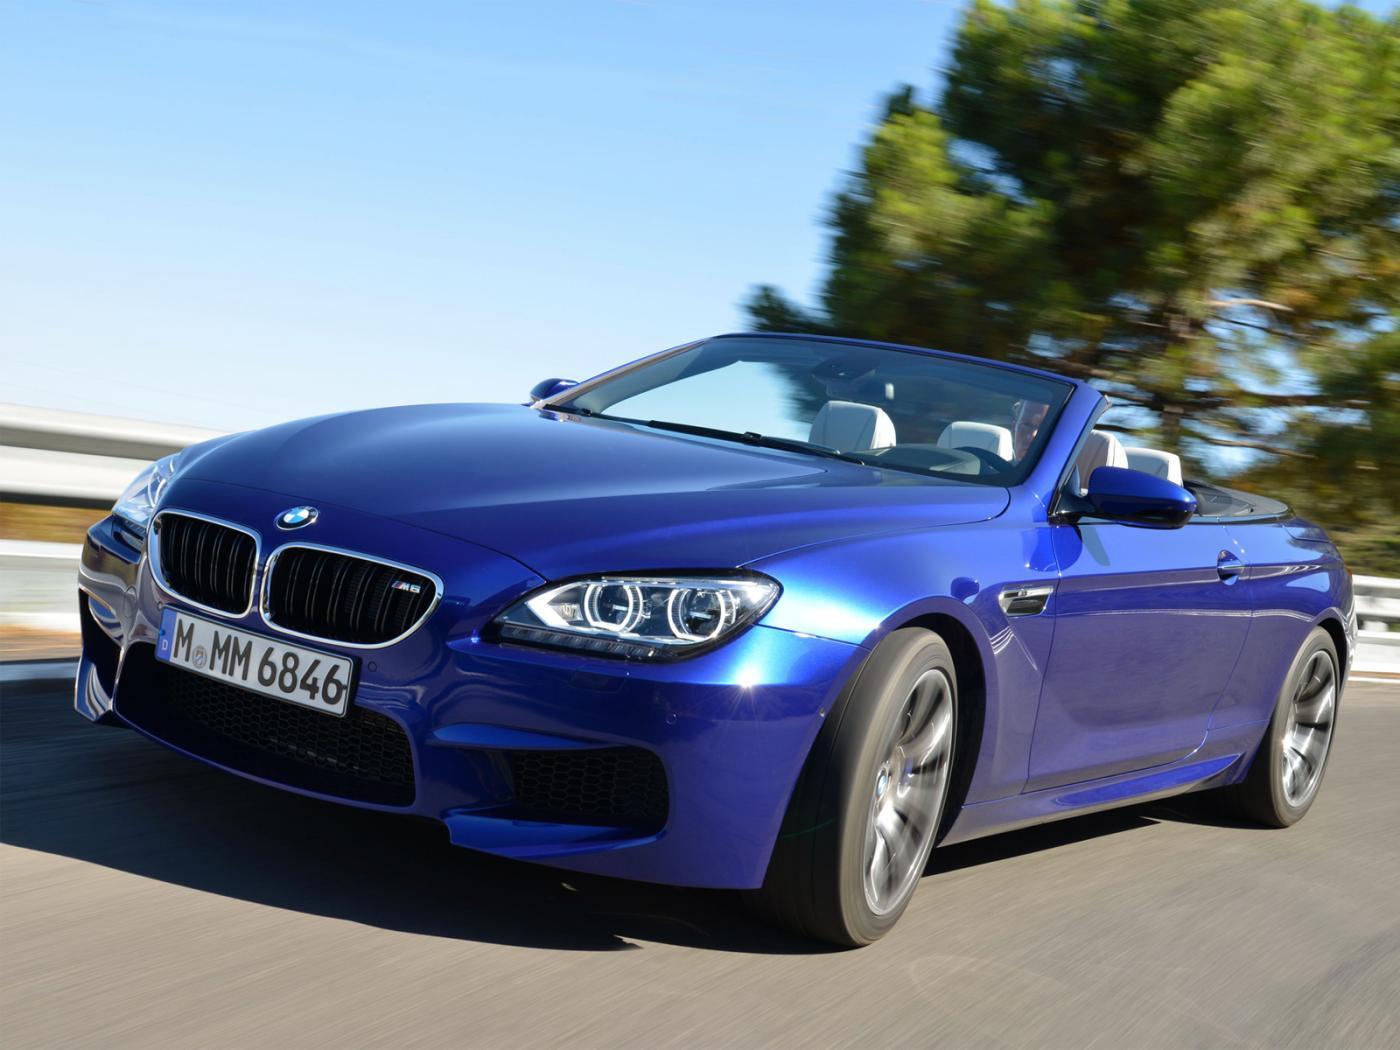 Fiche-occasion-BMW-M6-F12-5.jpeg